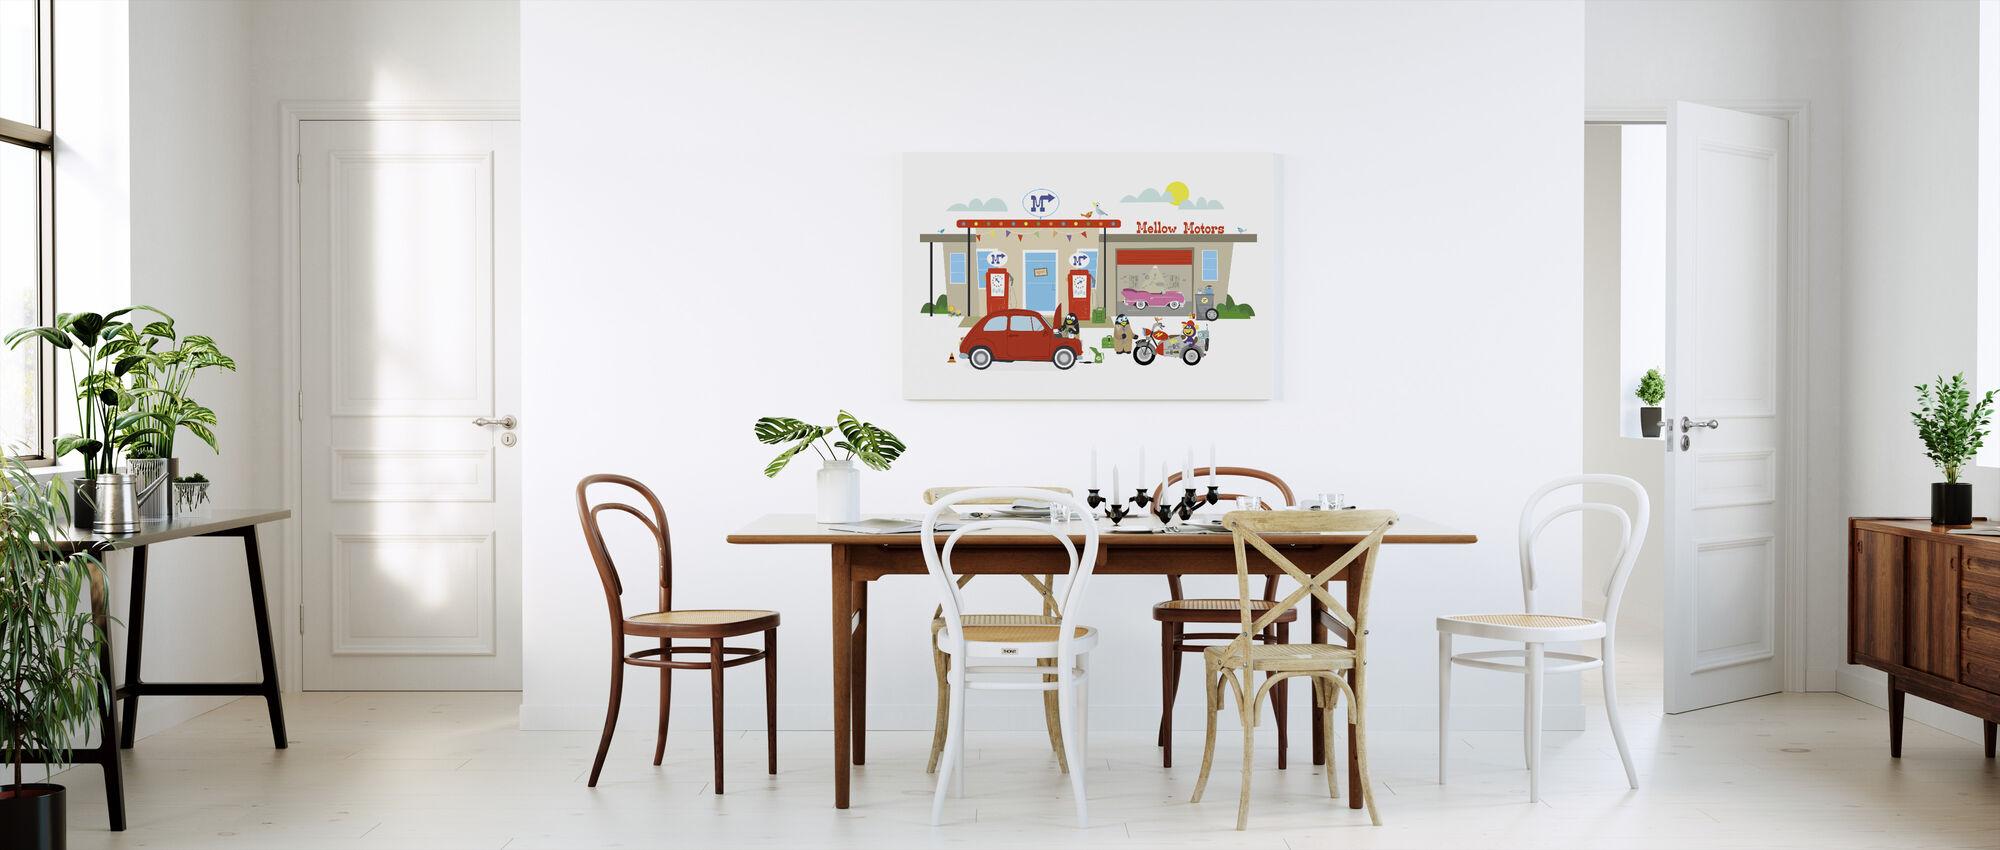 Rockhoppers Mellow Motors - Canvas print - Kitchen